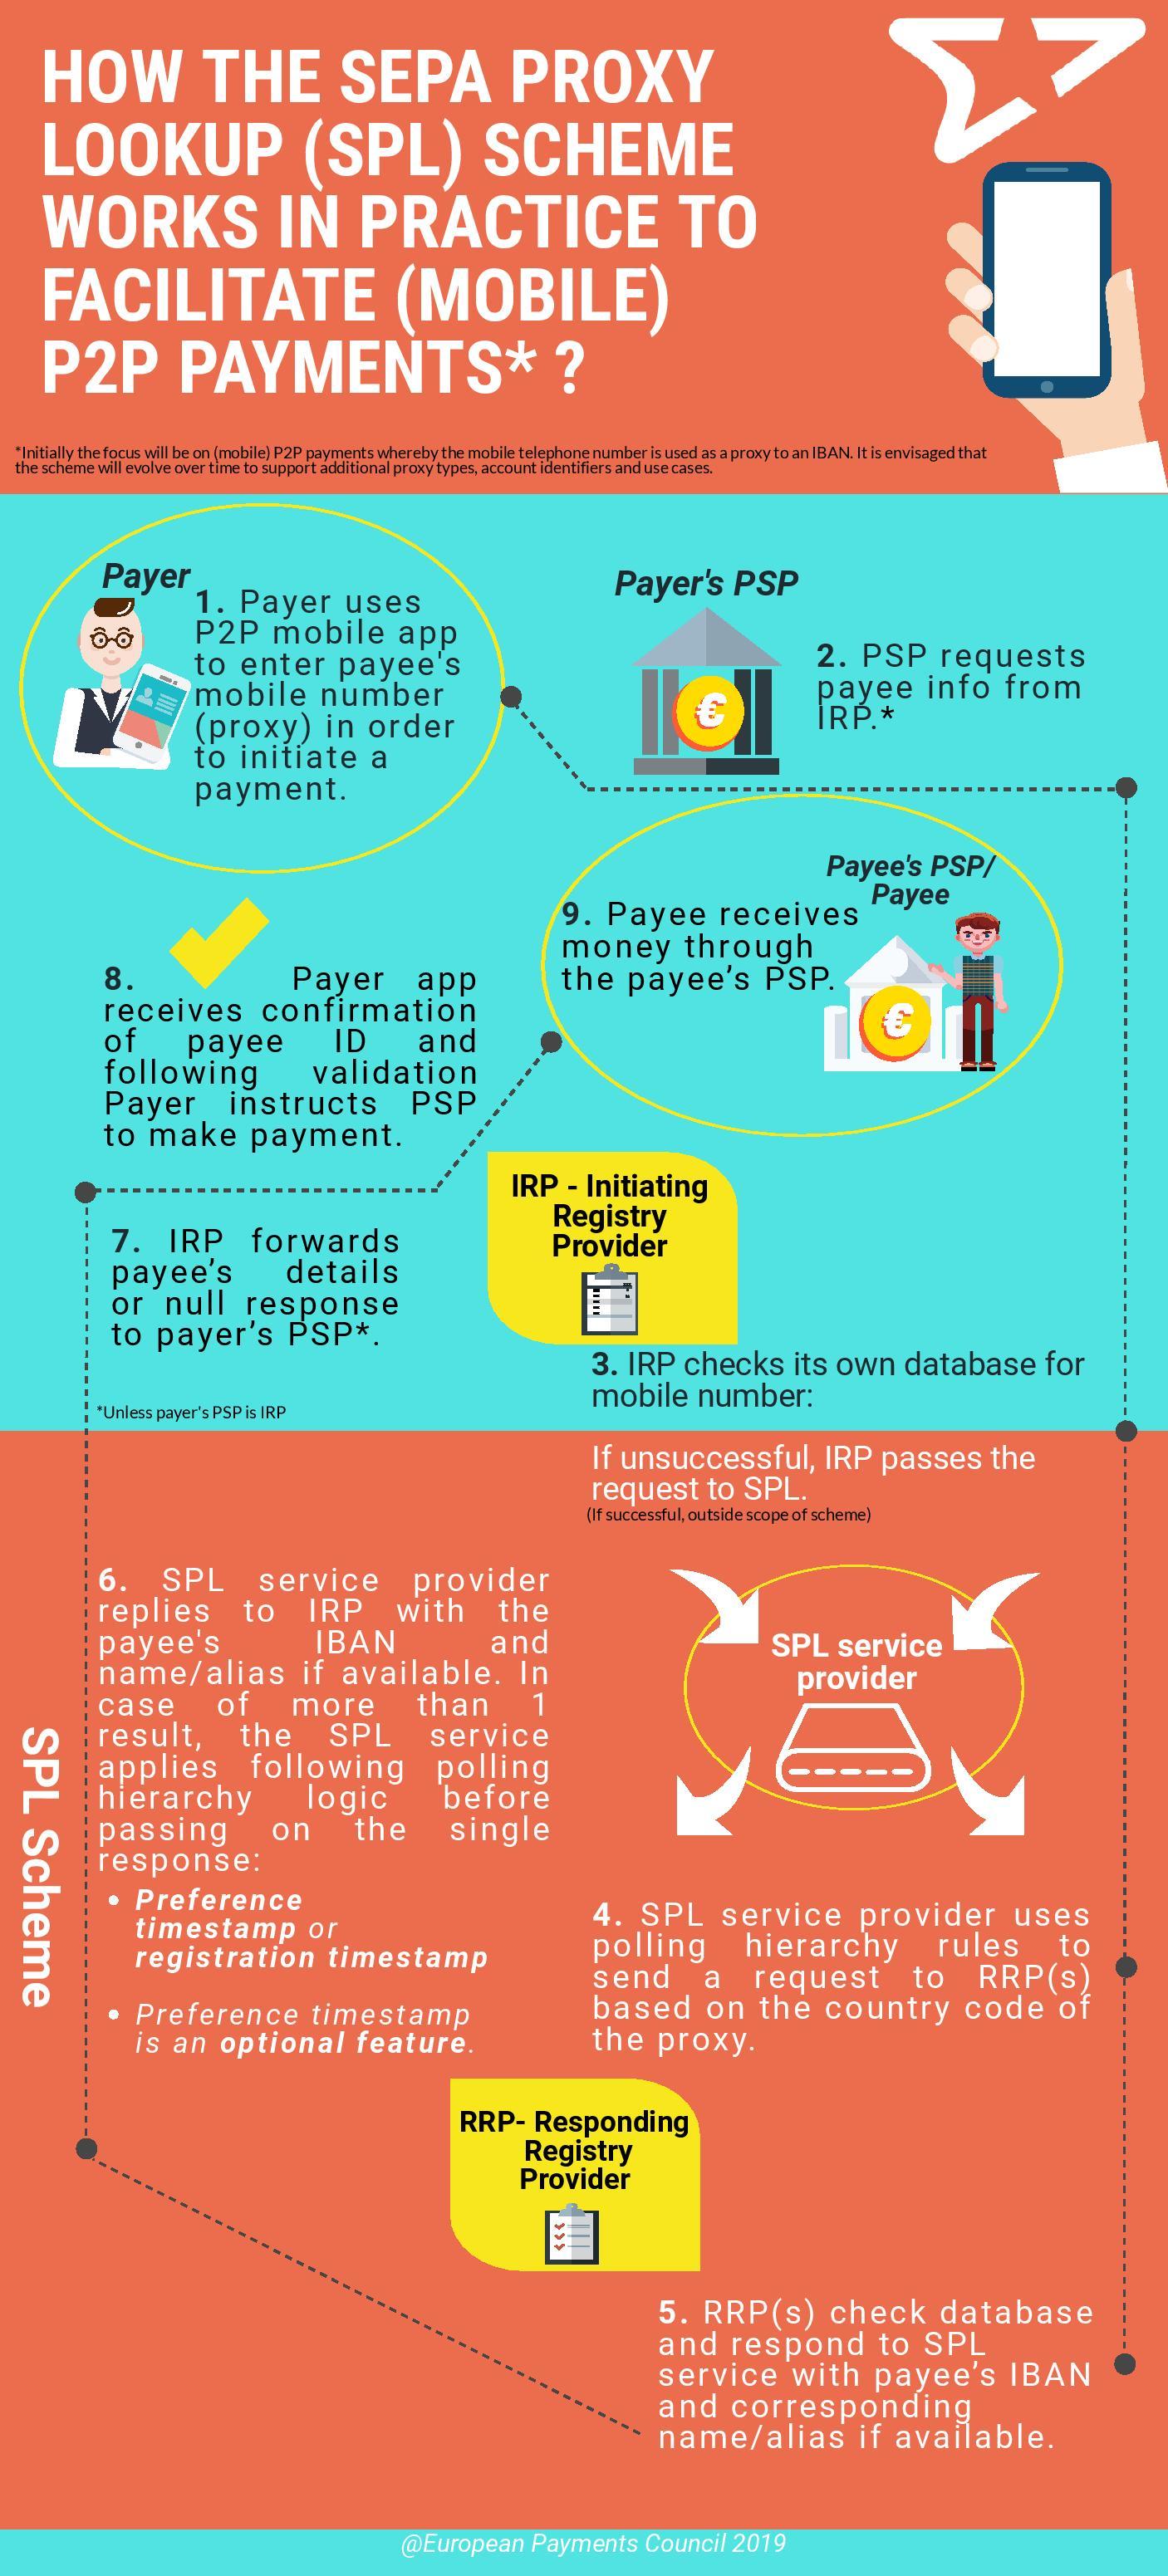 SEPA Proxy Lookup